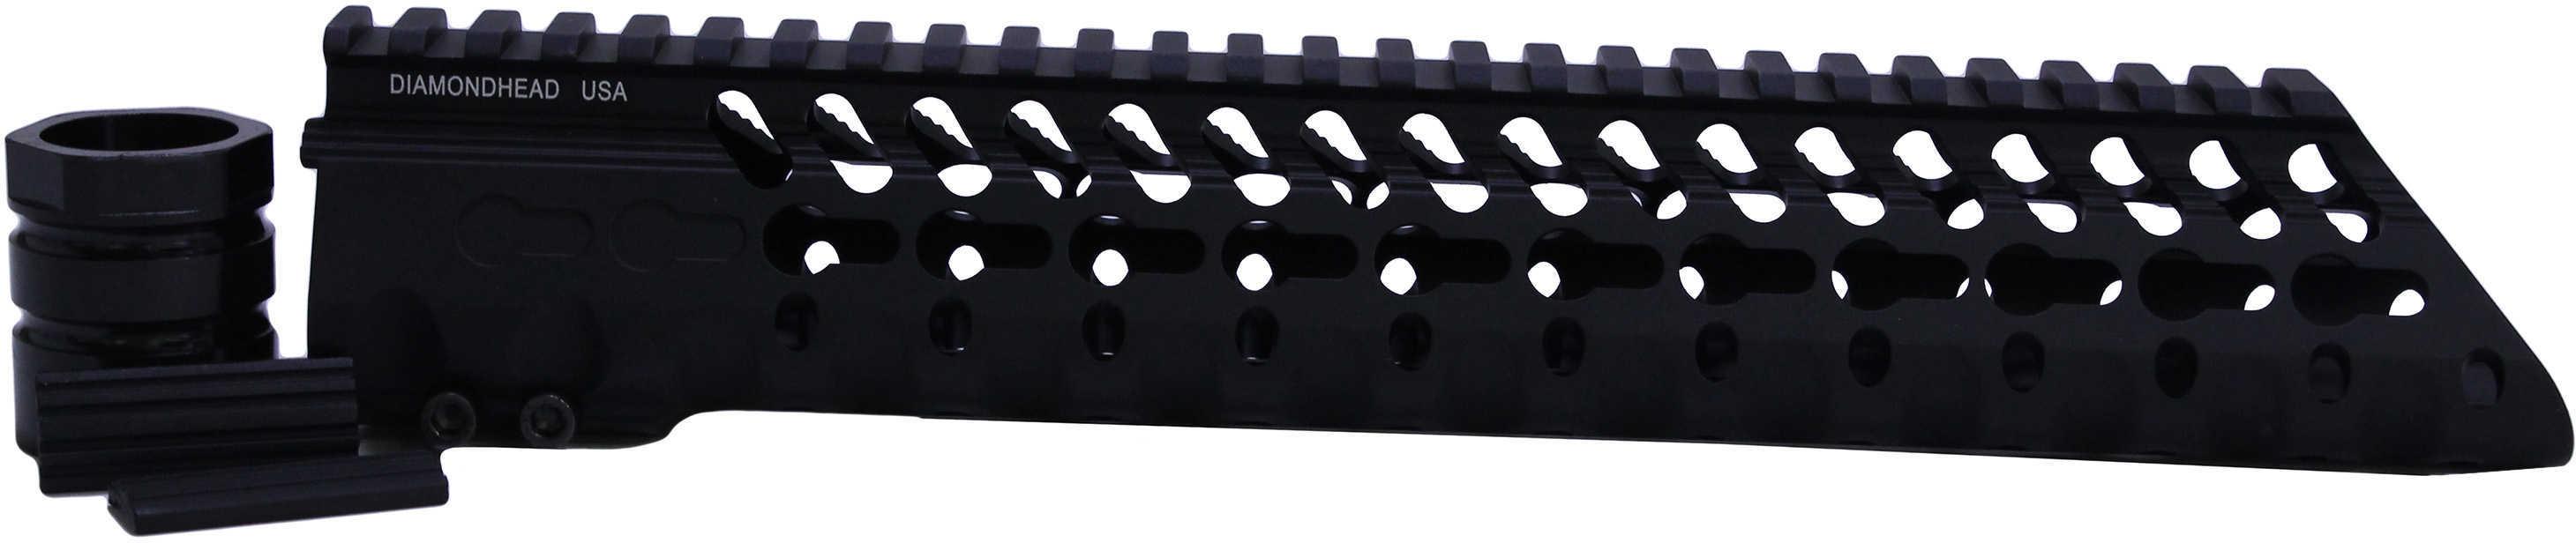 "Diamondhead USA Inc. VRS-T Free-Floating KeyMod Handguard Rail Fits AR-15 10.25"" Black Finish 2215"